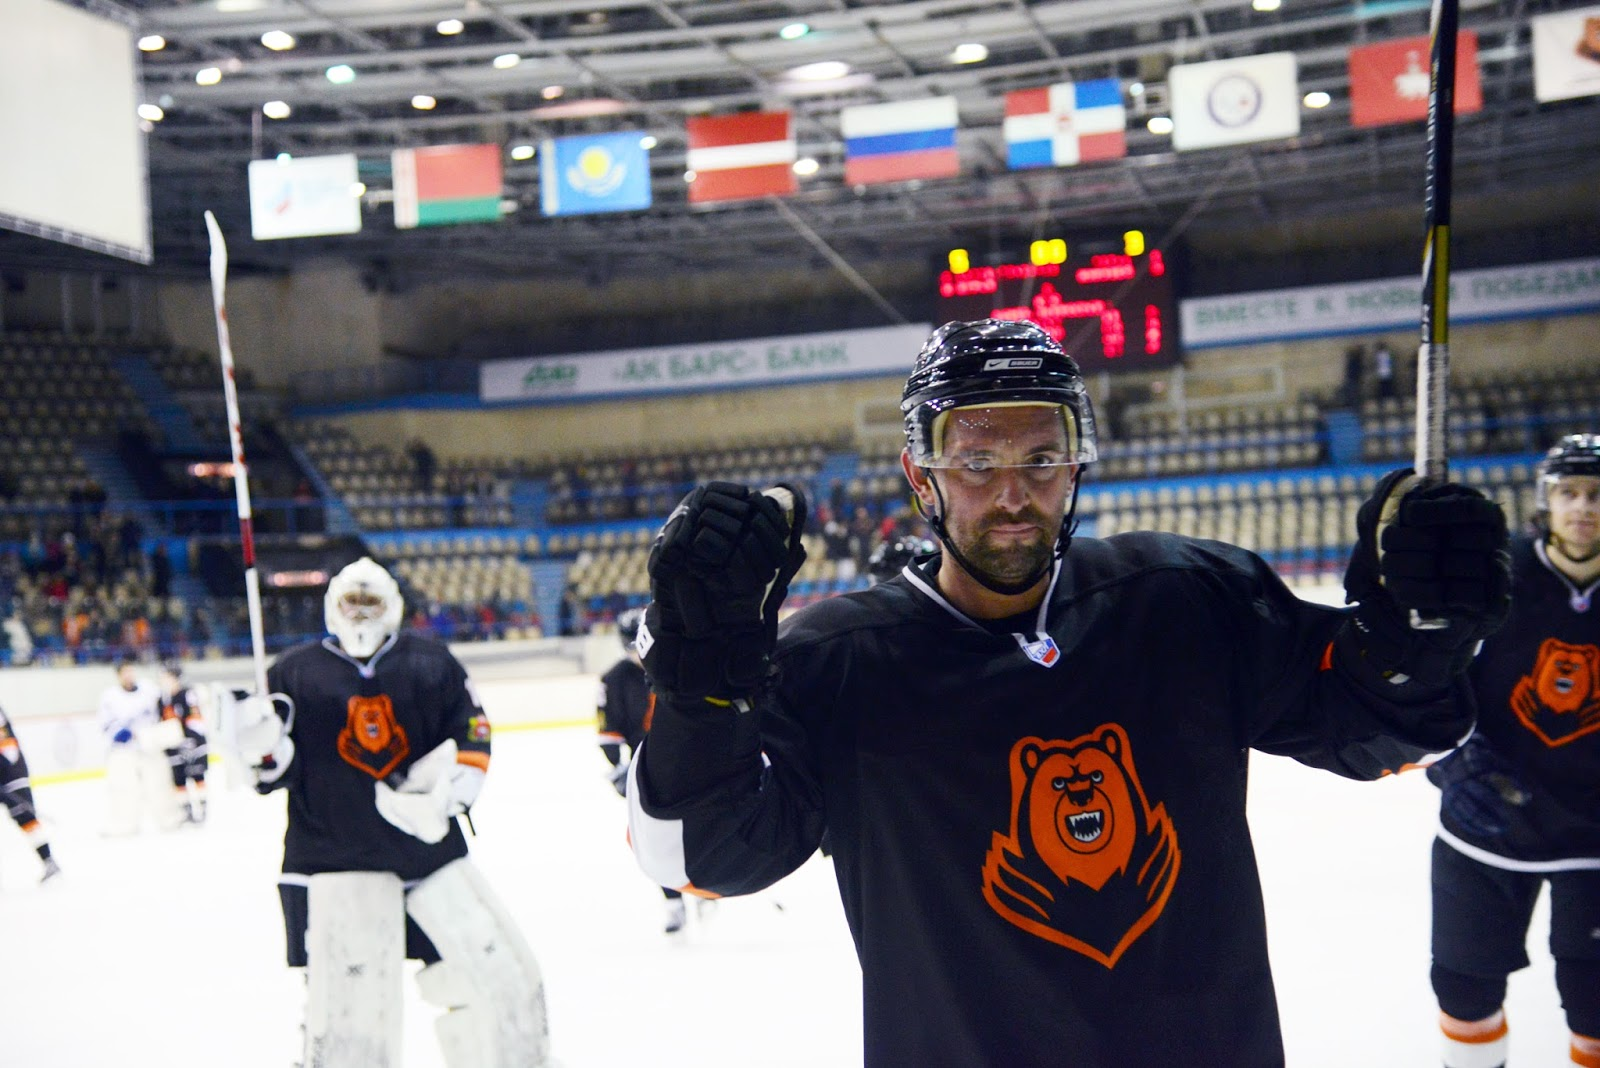 Корнеев, краги купи Как Салават Юлаев открыл сезон